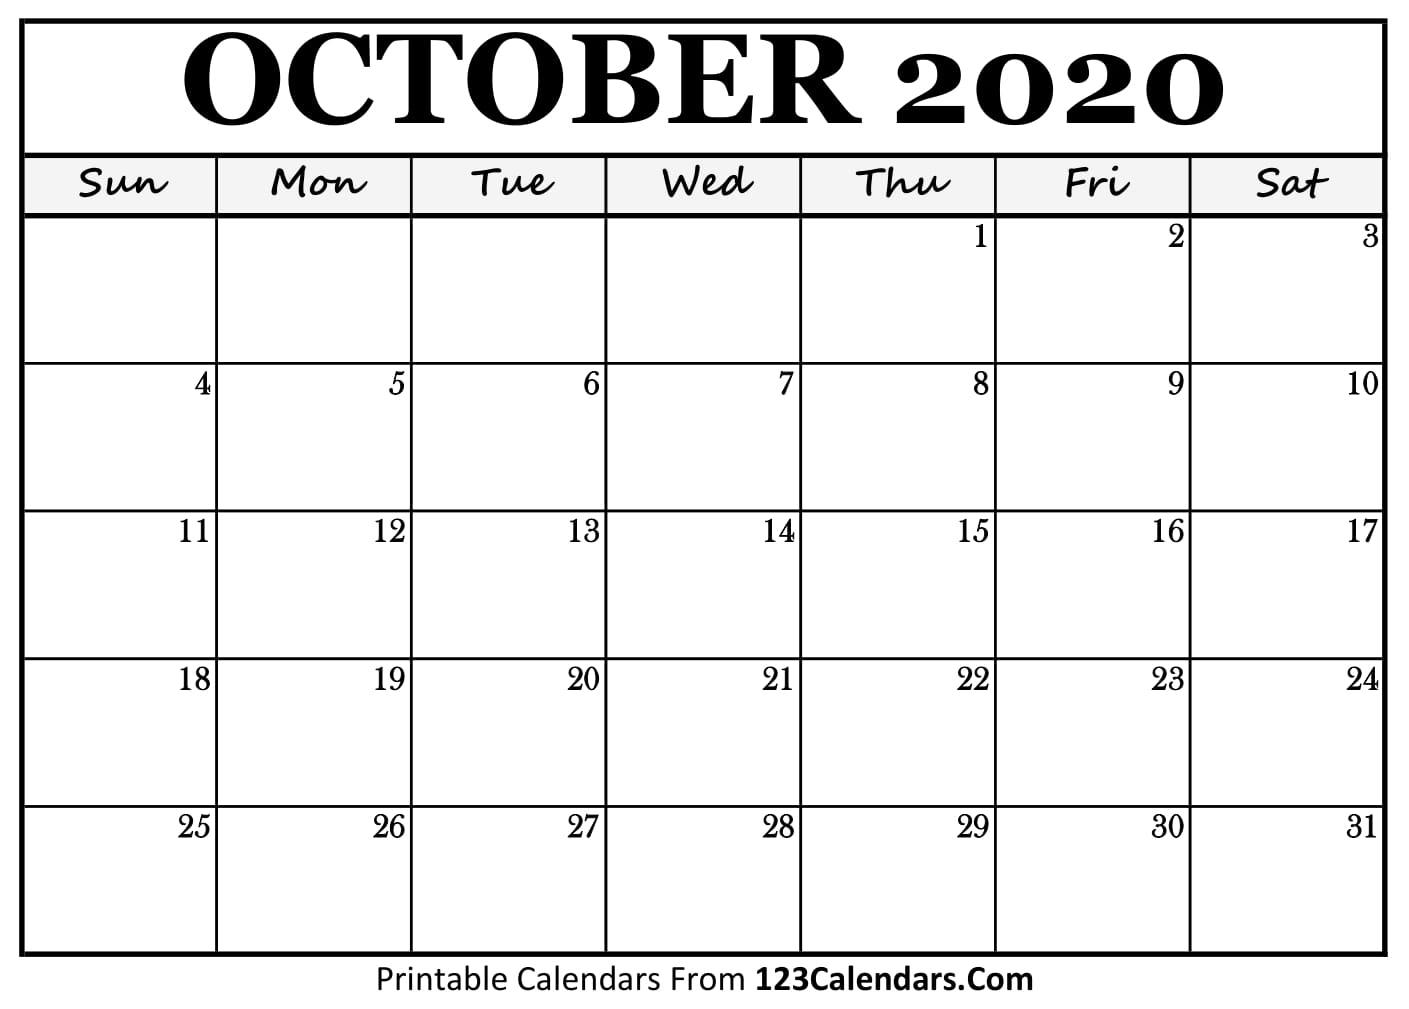 Printable October 2020 Calendar Templates 123calendars Com